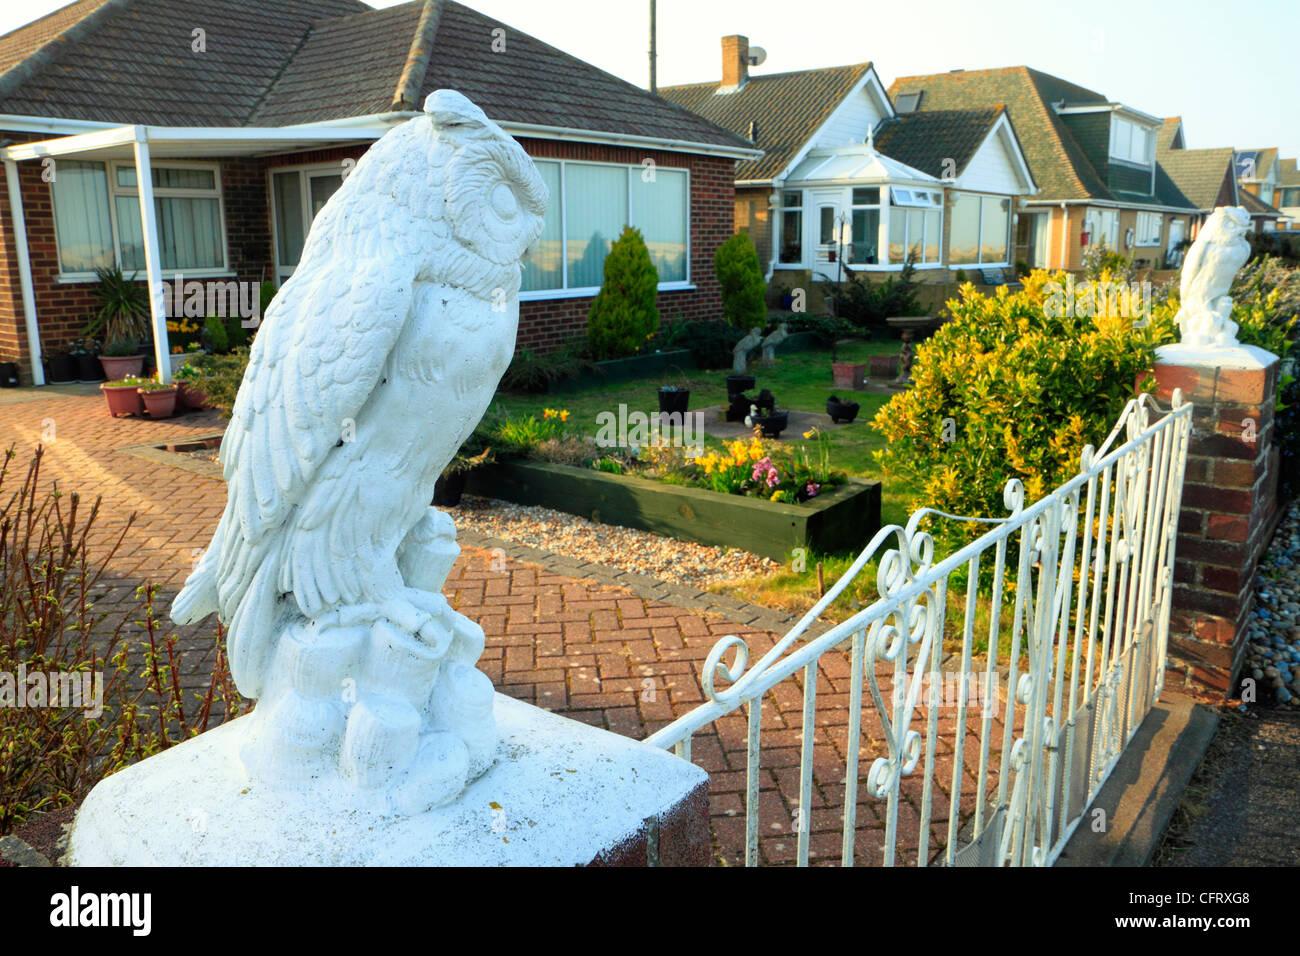 Ornamental owl figures on gatepost of house, Greatstone, Kent - Stock Image